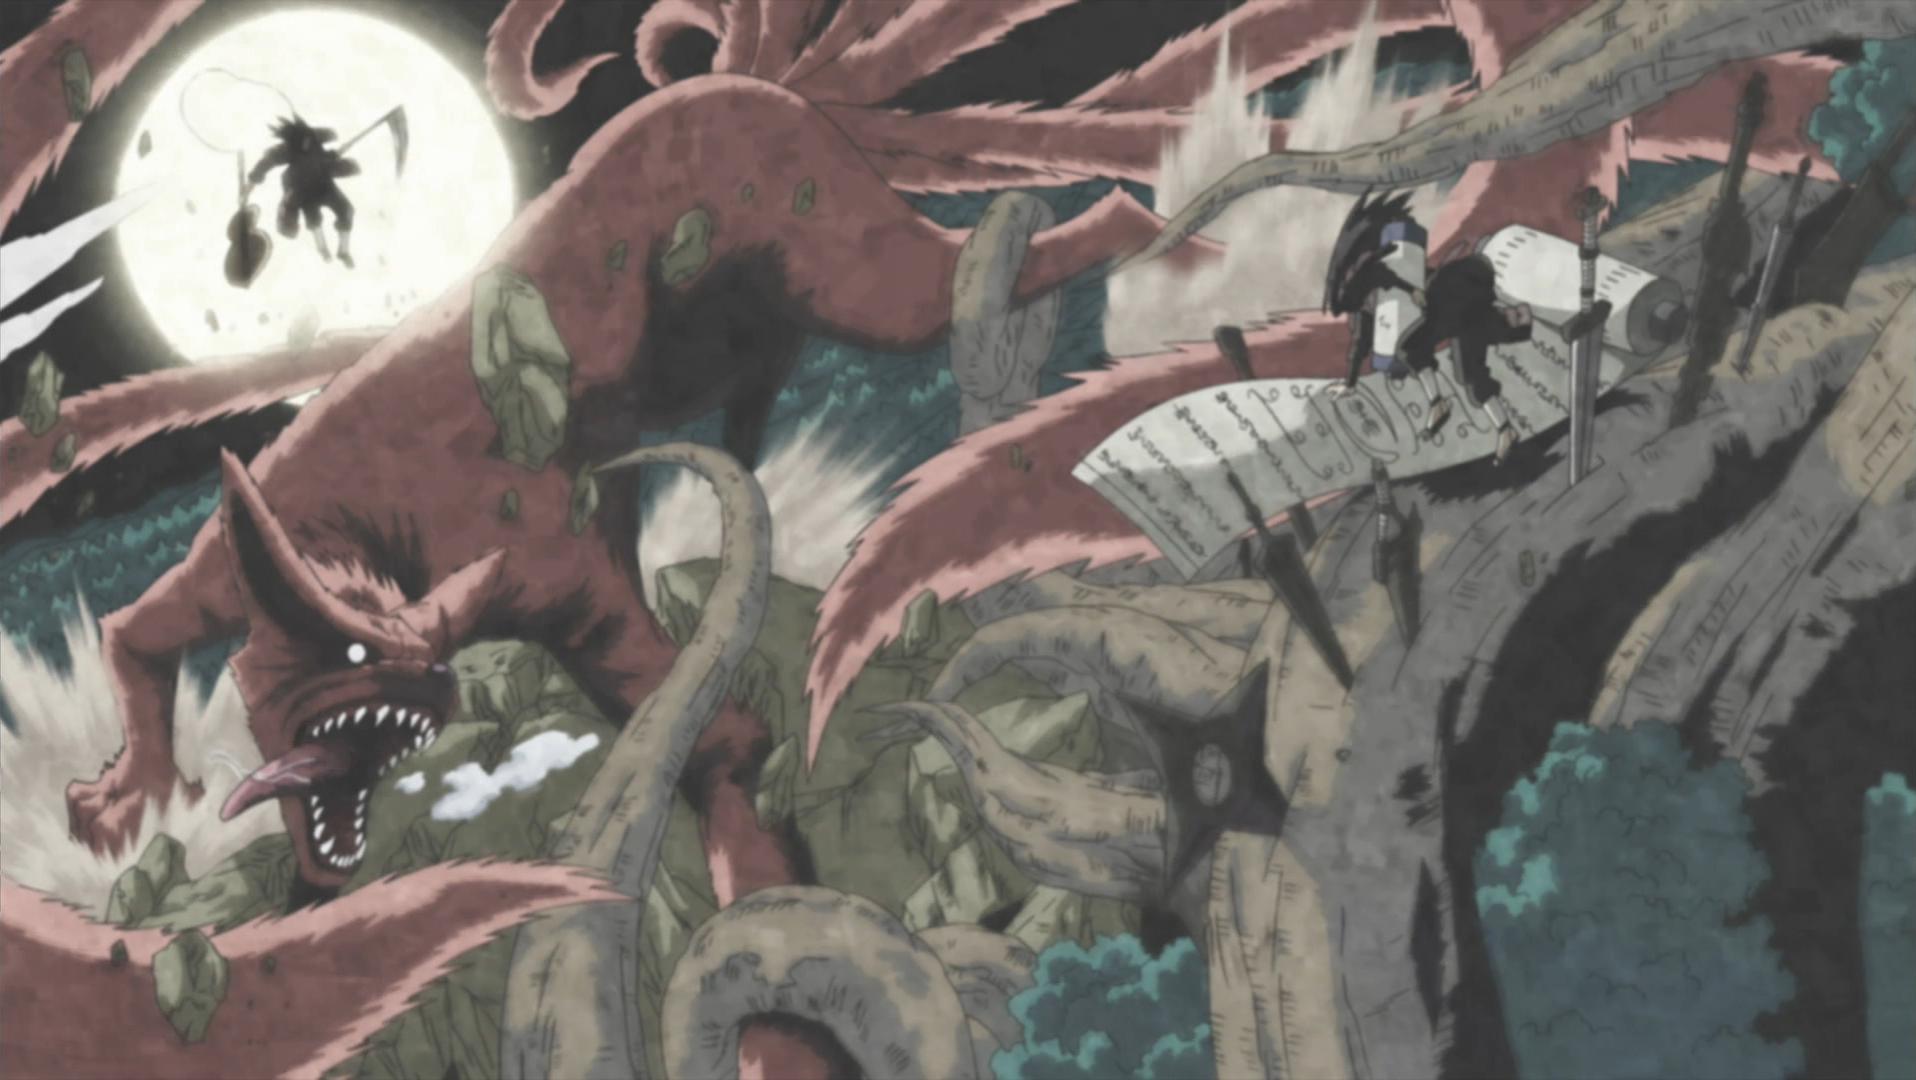 Fate | Narutopedia | FANDOM powered by Wikia